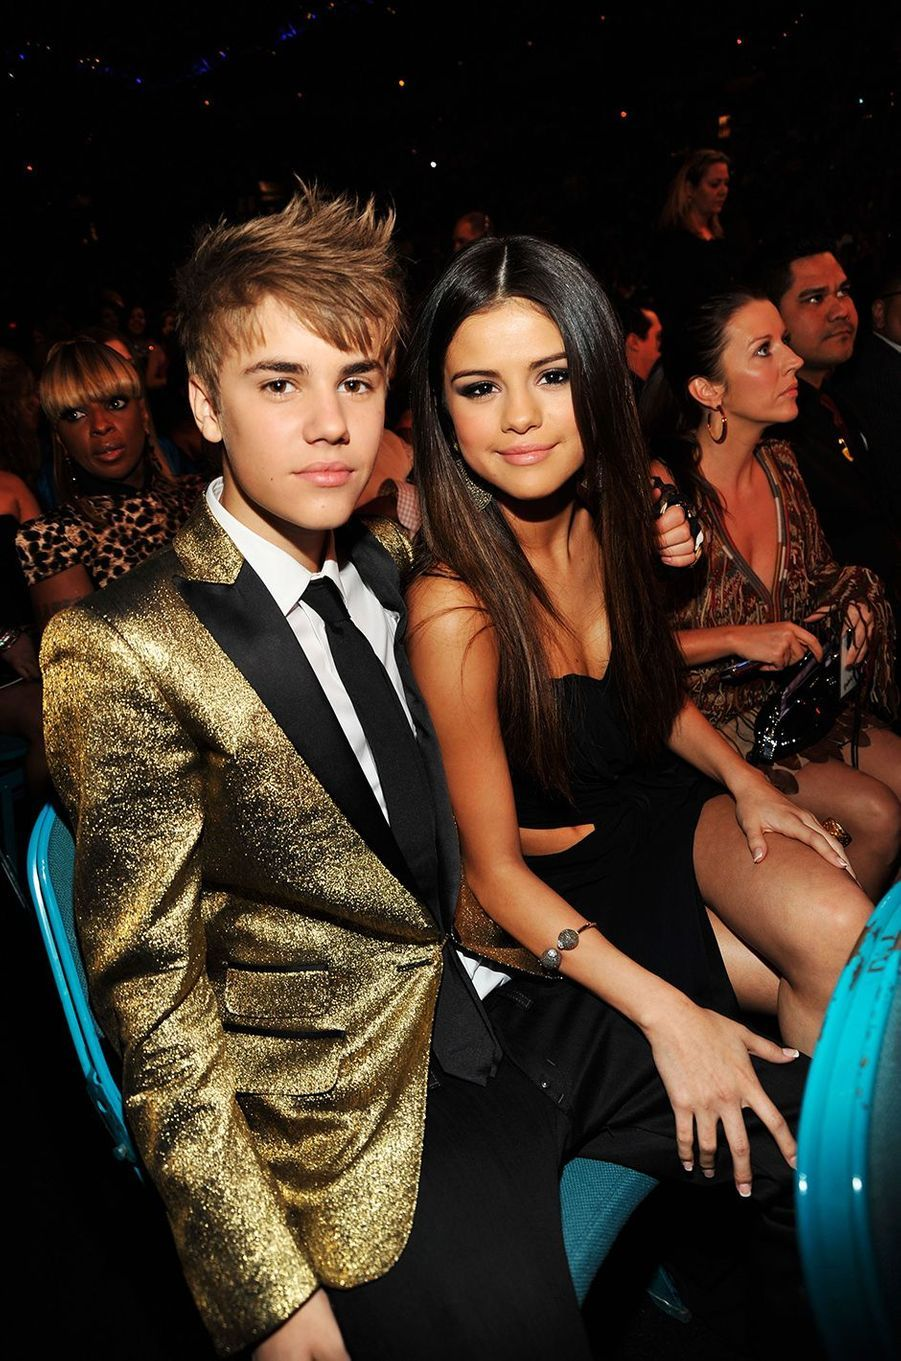 Justin Bieber et Selena Gomez aux Billboard Music Awards 2011.